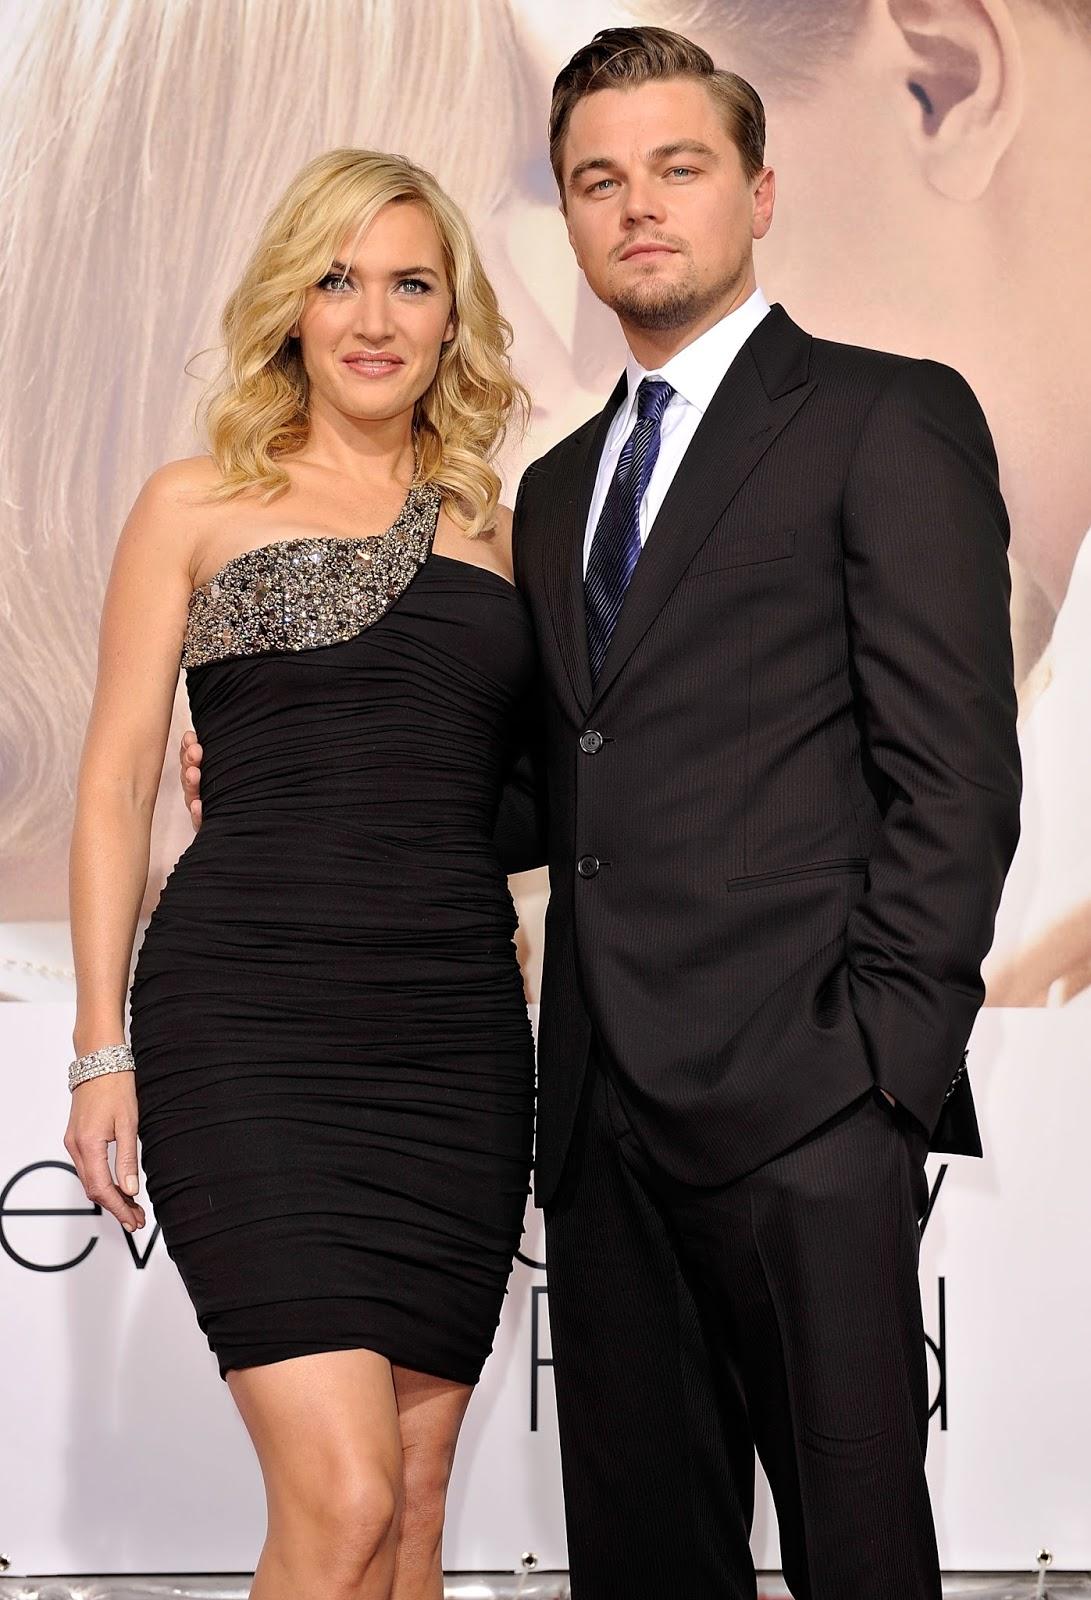 Kate-Winslet-Leonardo-DiCaprio-LA-Premiere-Revolutionary-Road